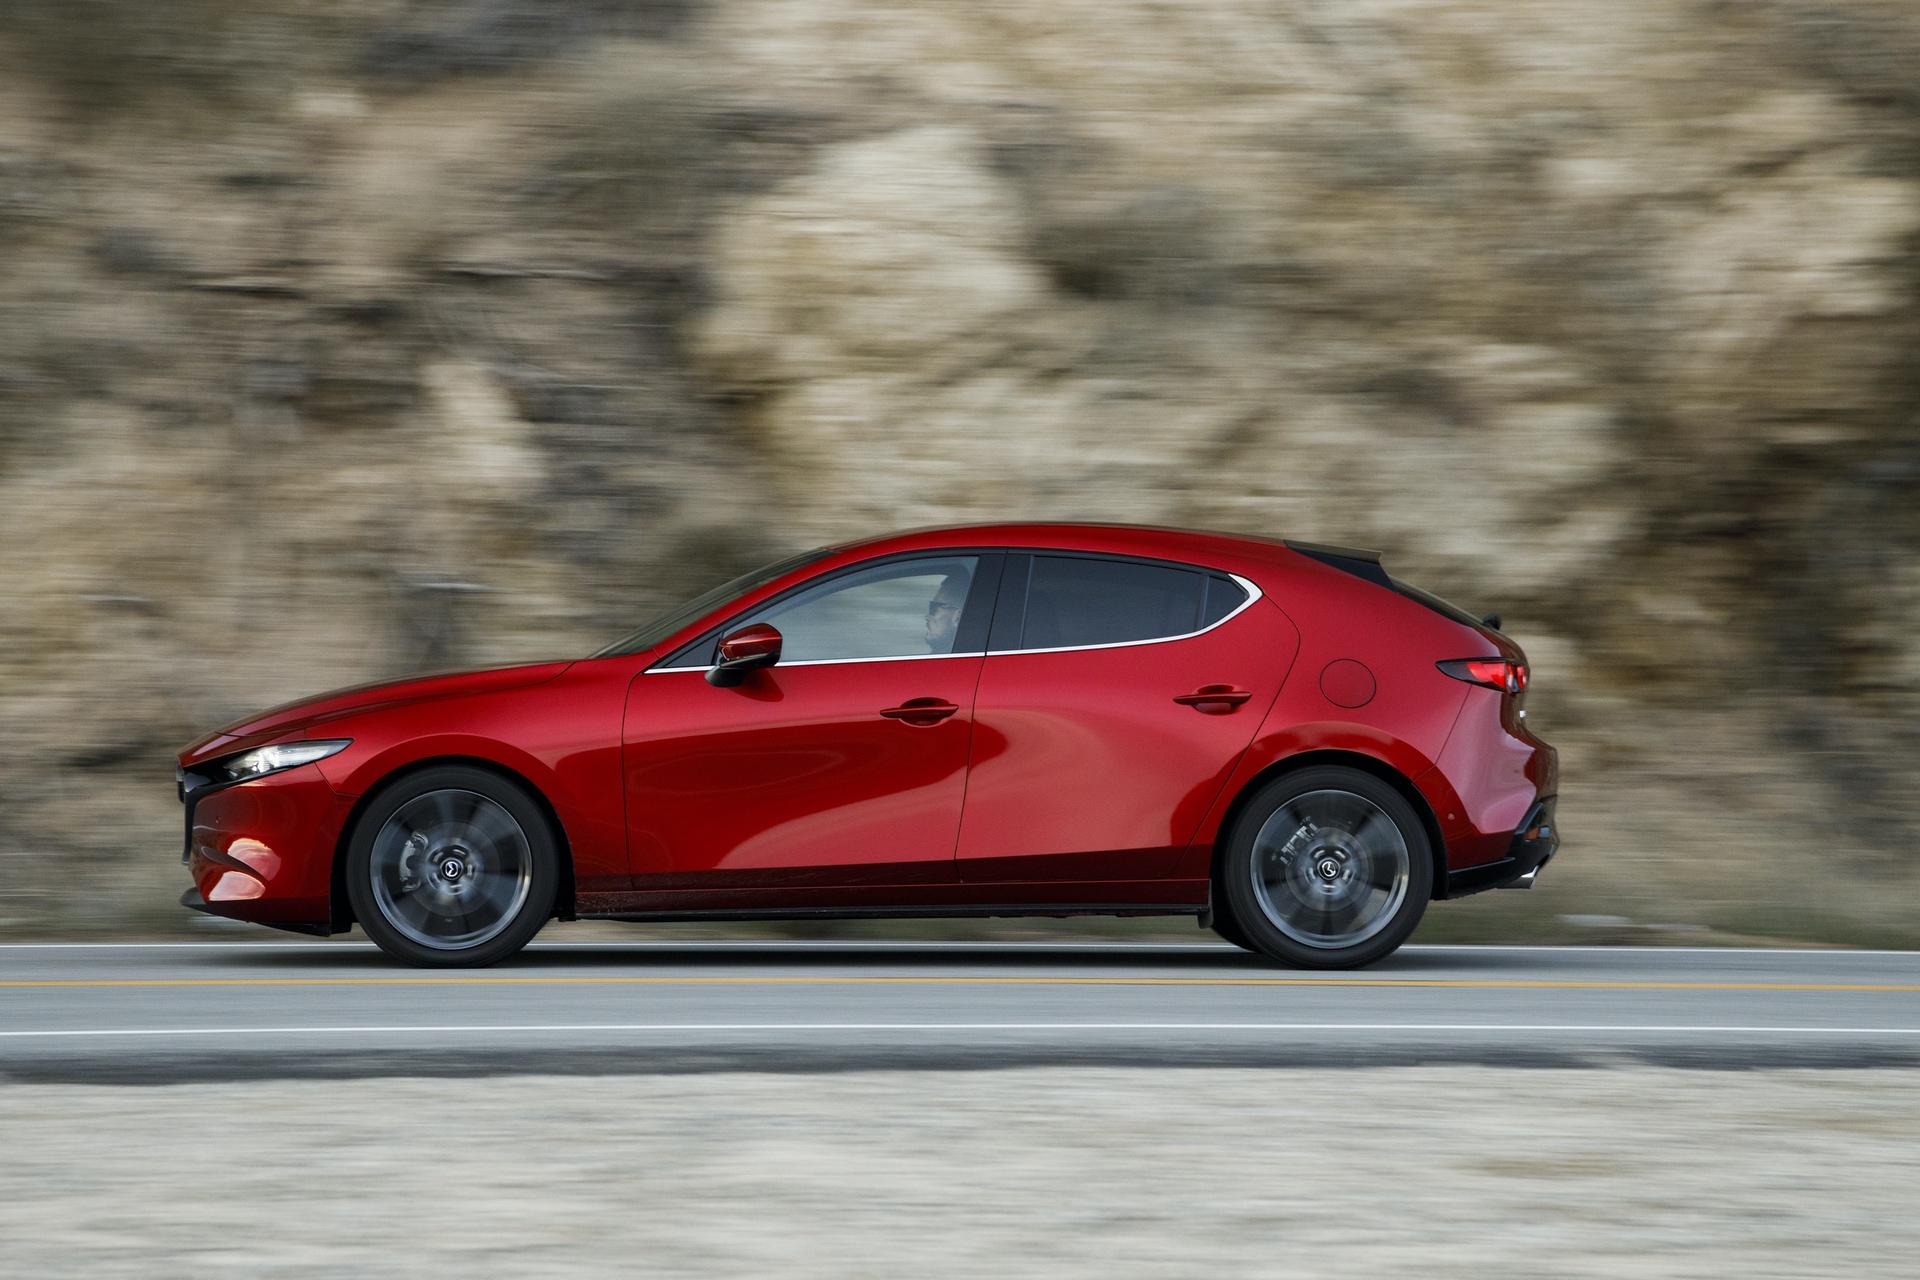 2019-Mazda3-Hatchback_30